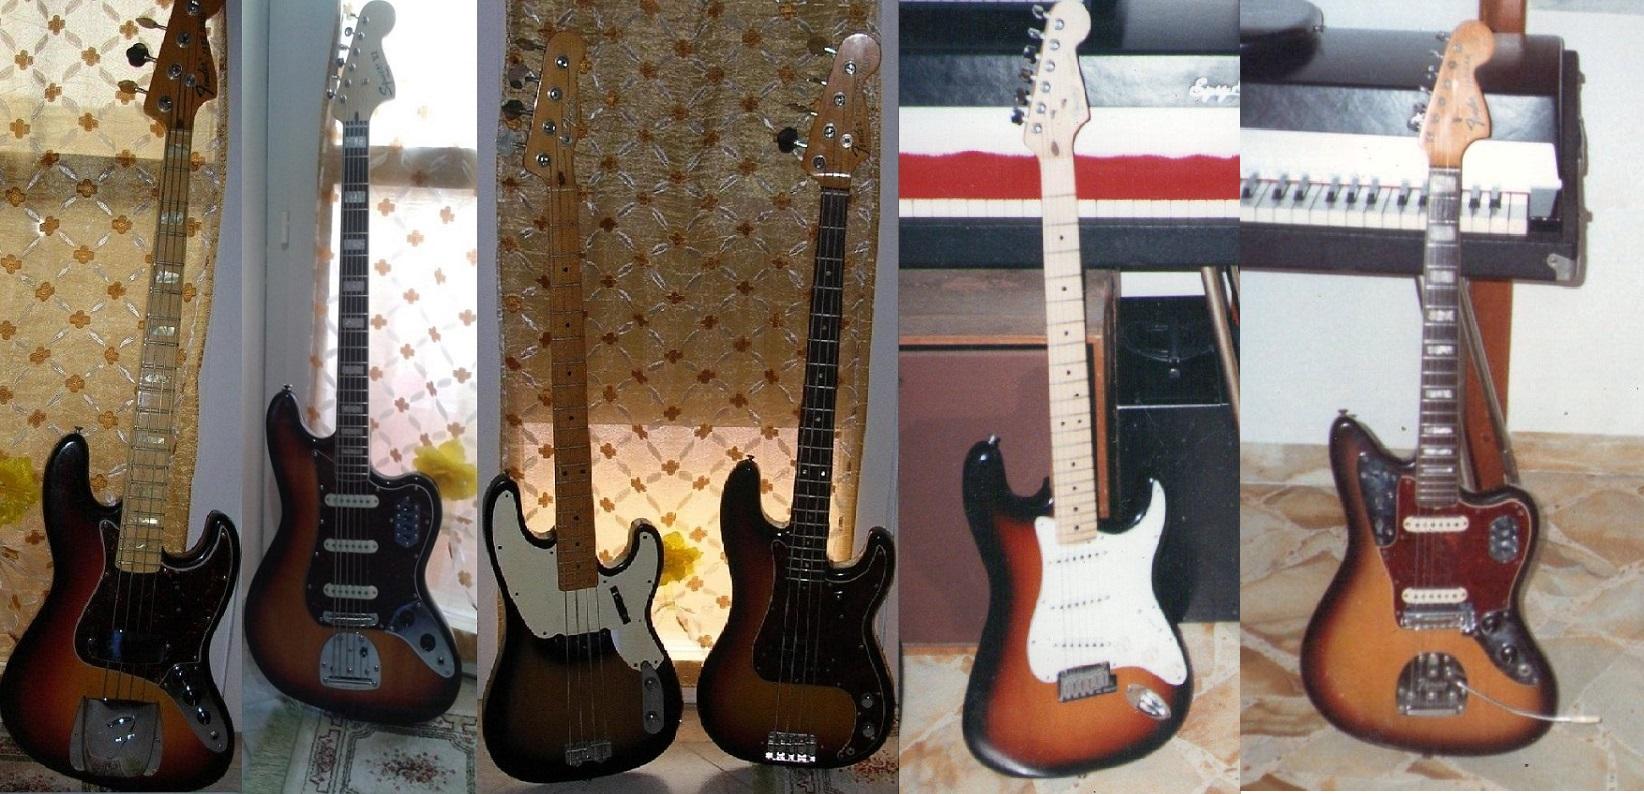 Le mie Fender coloratissime!